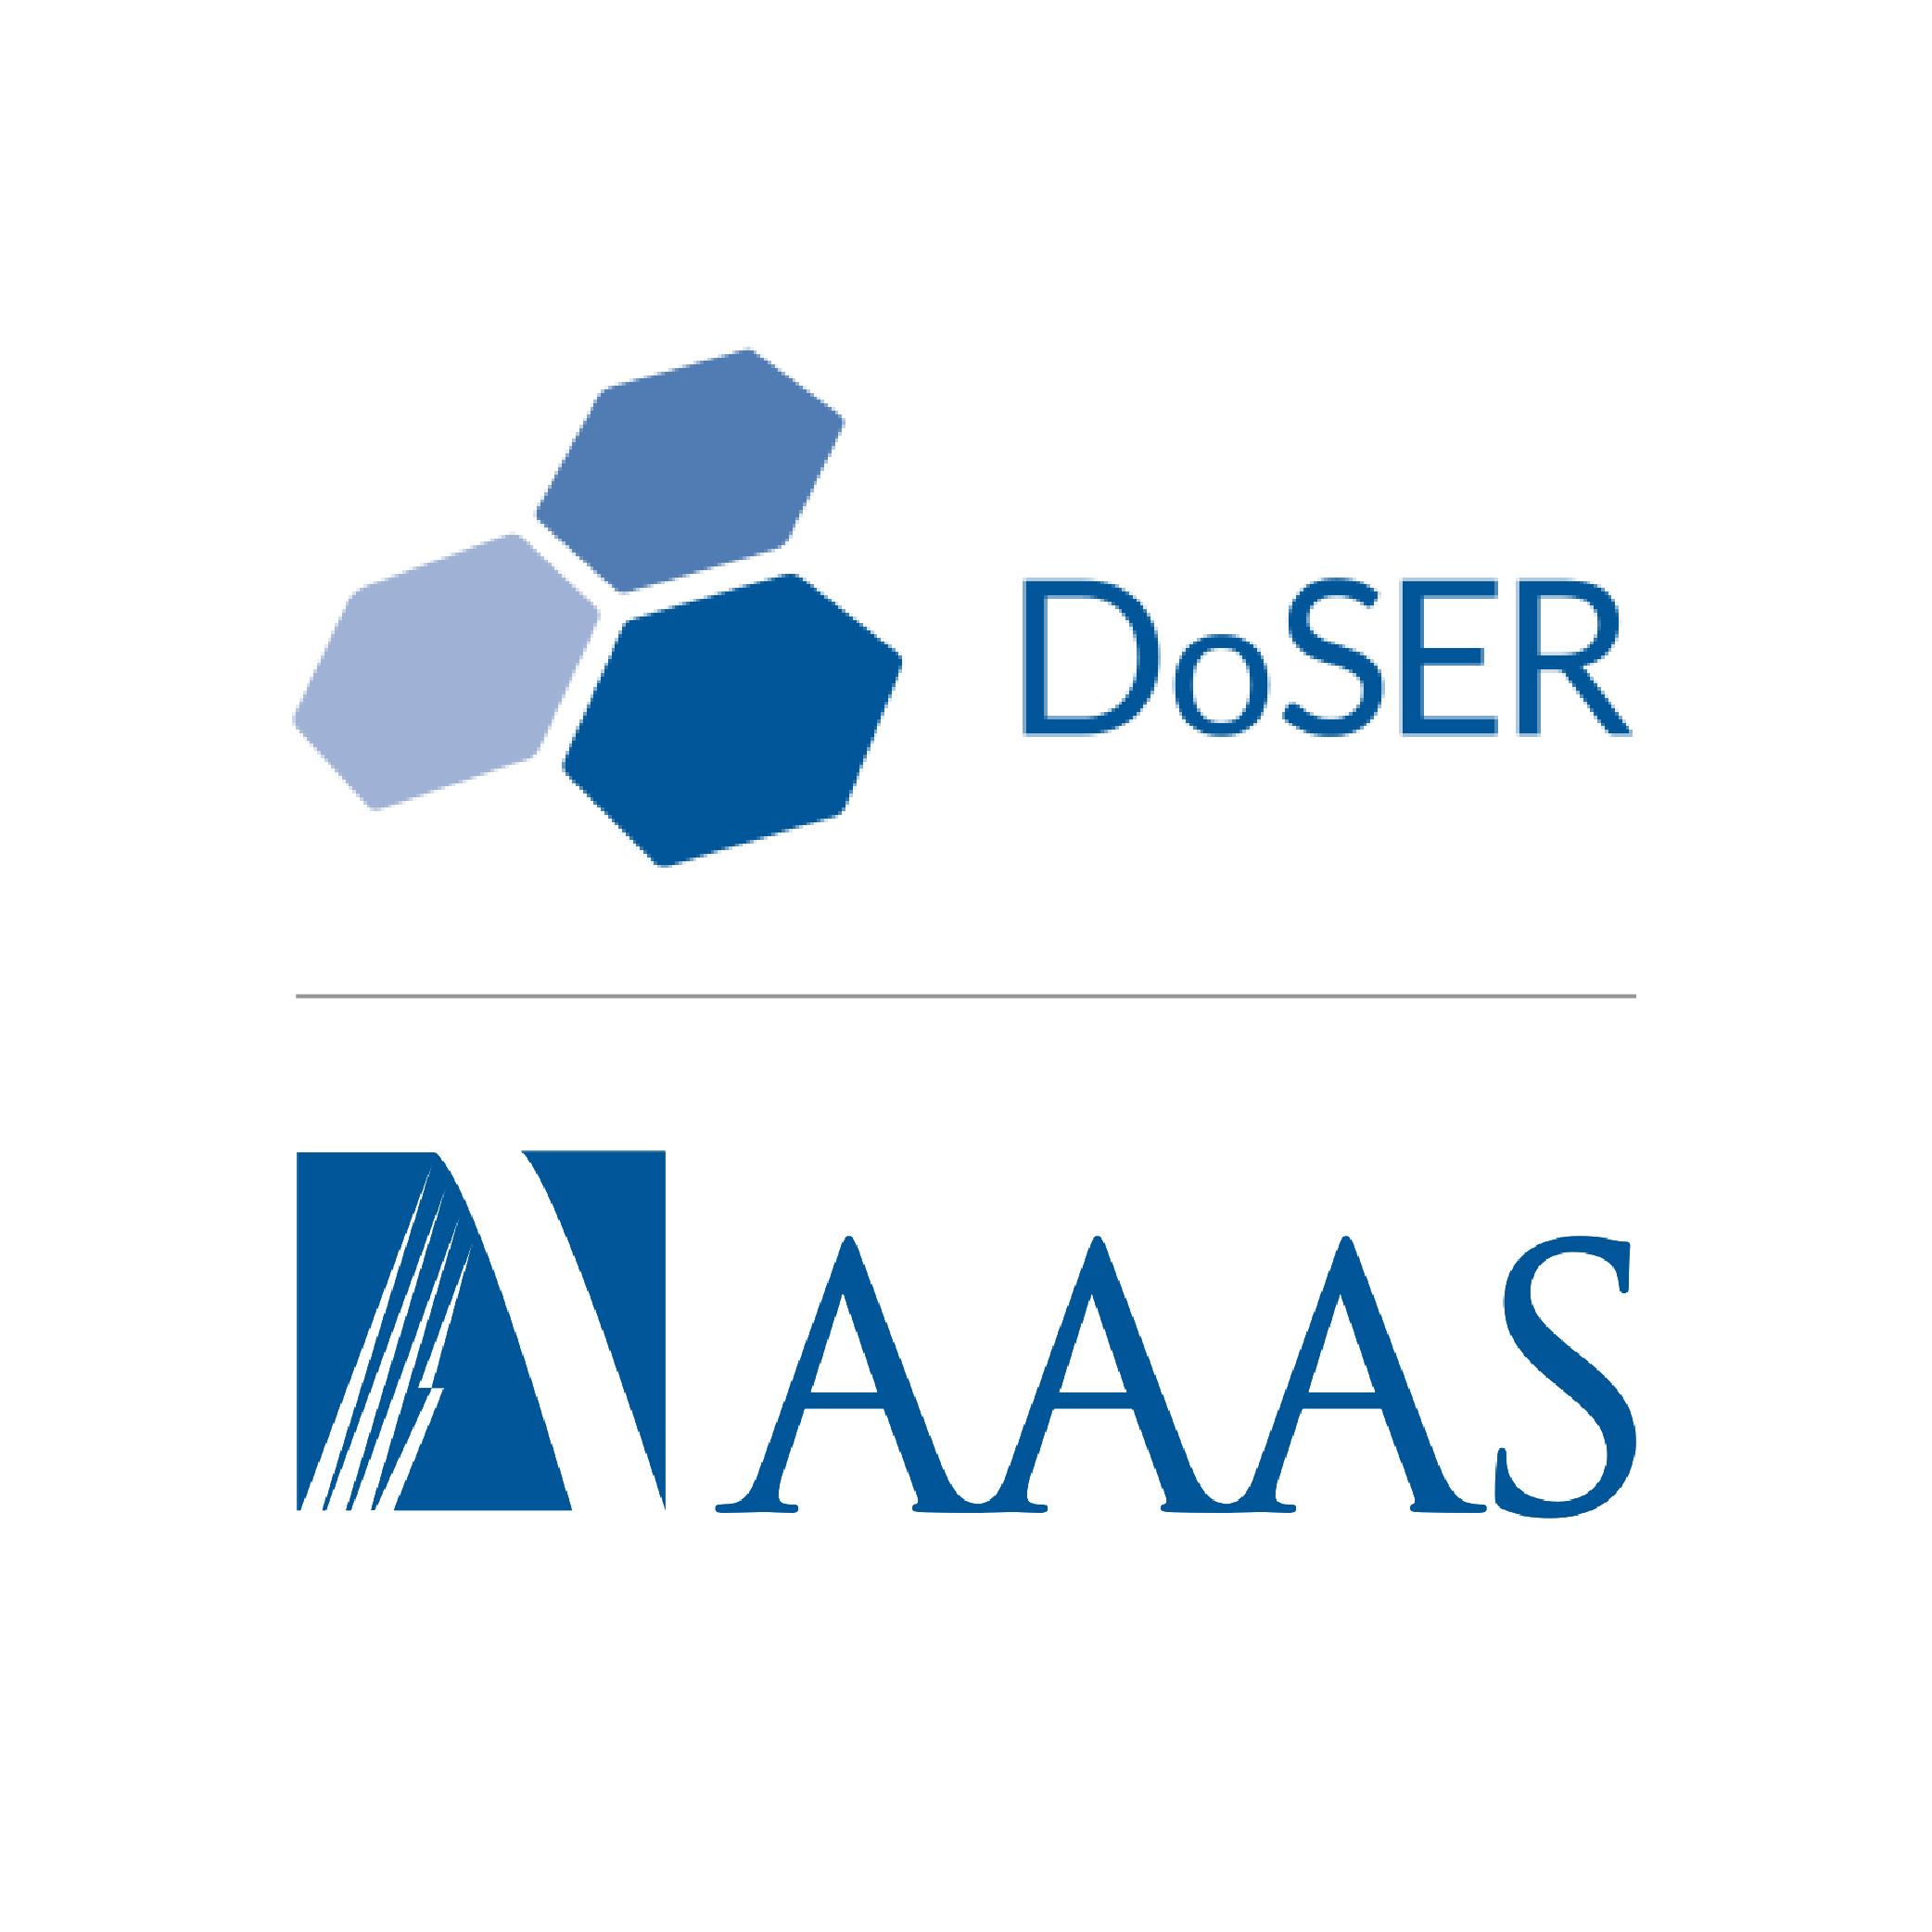 AAAS-DoSER